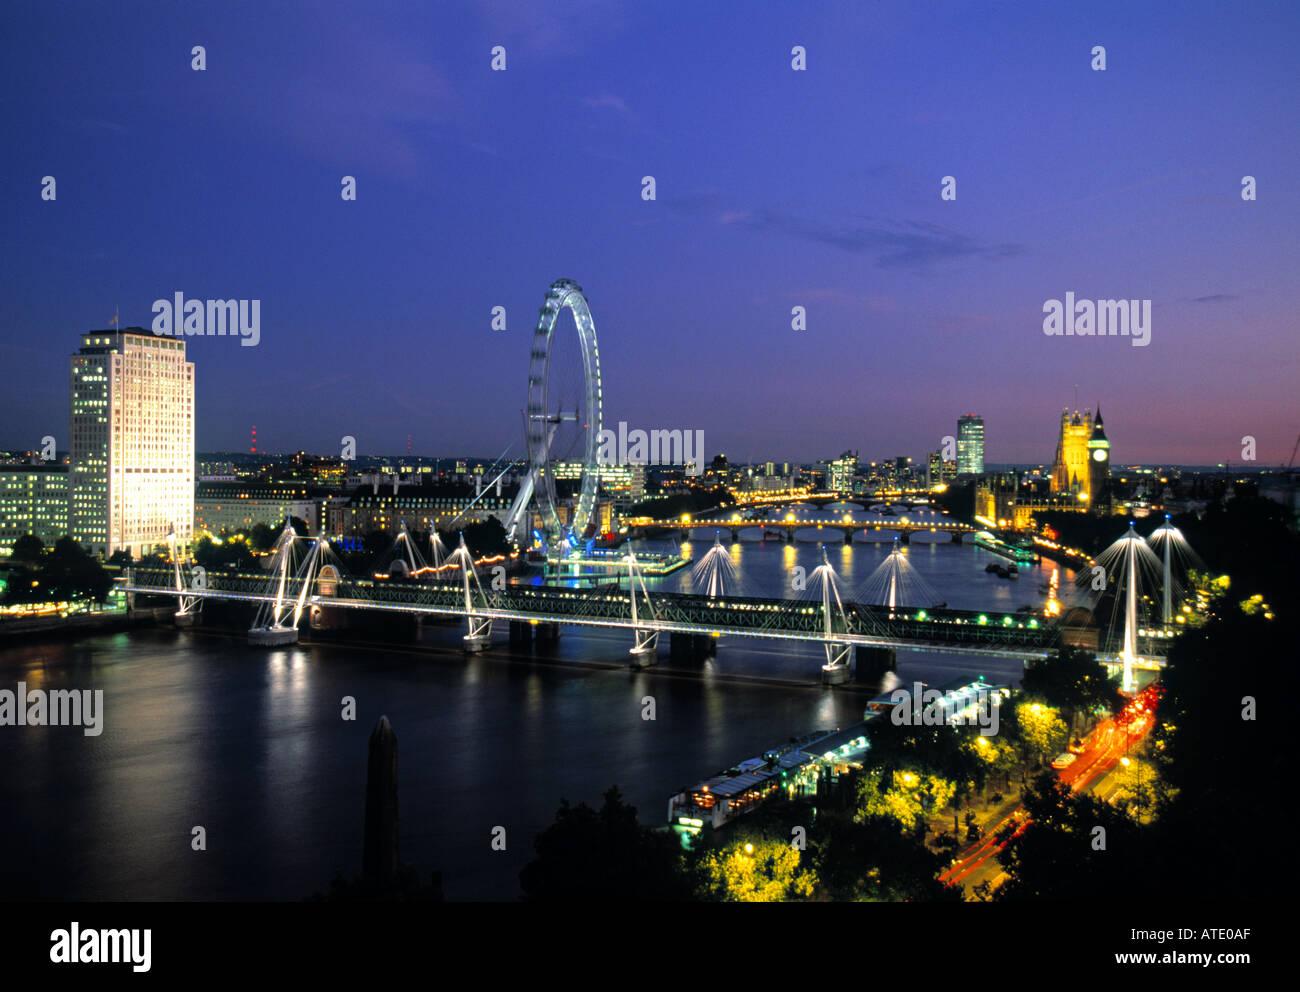 River Thames, London, England Stock Photo